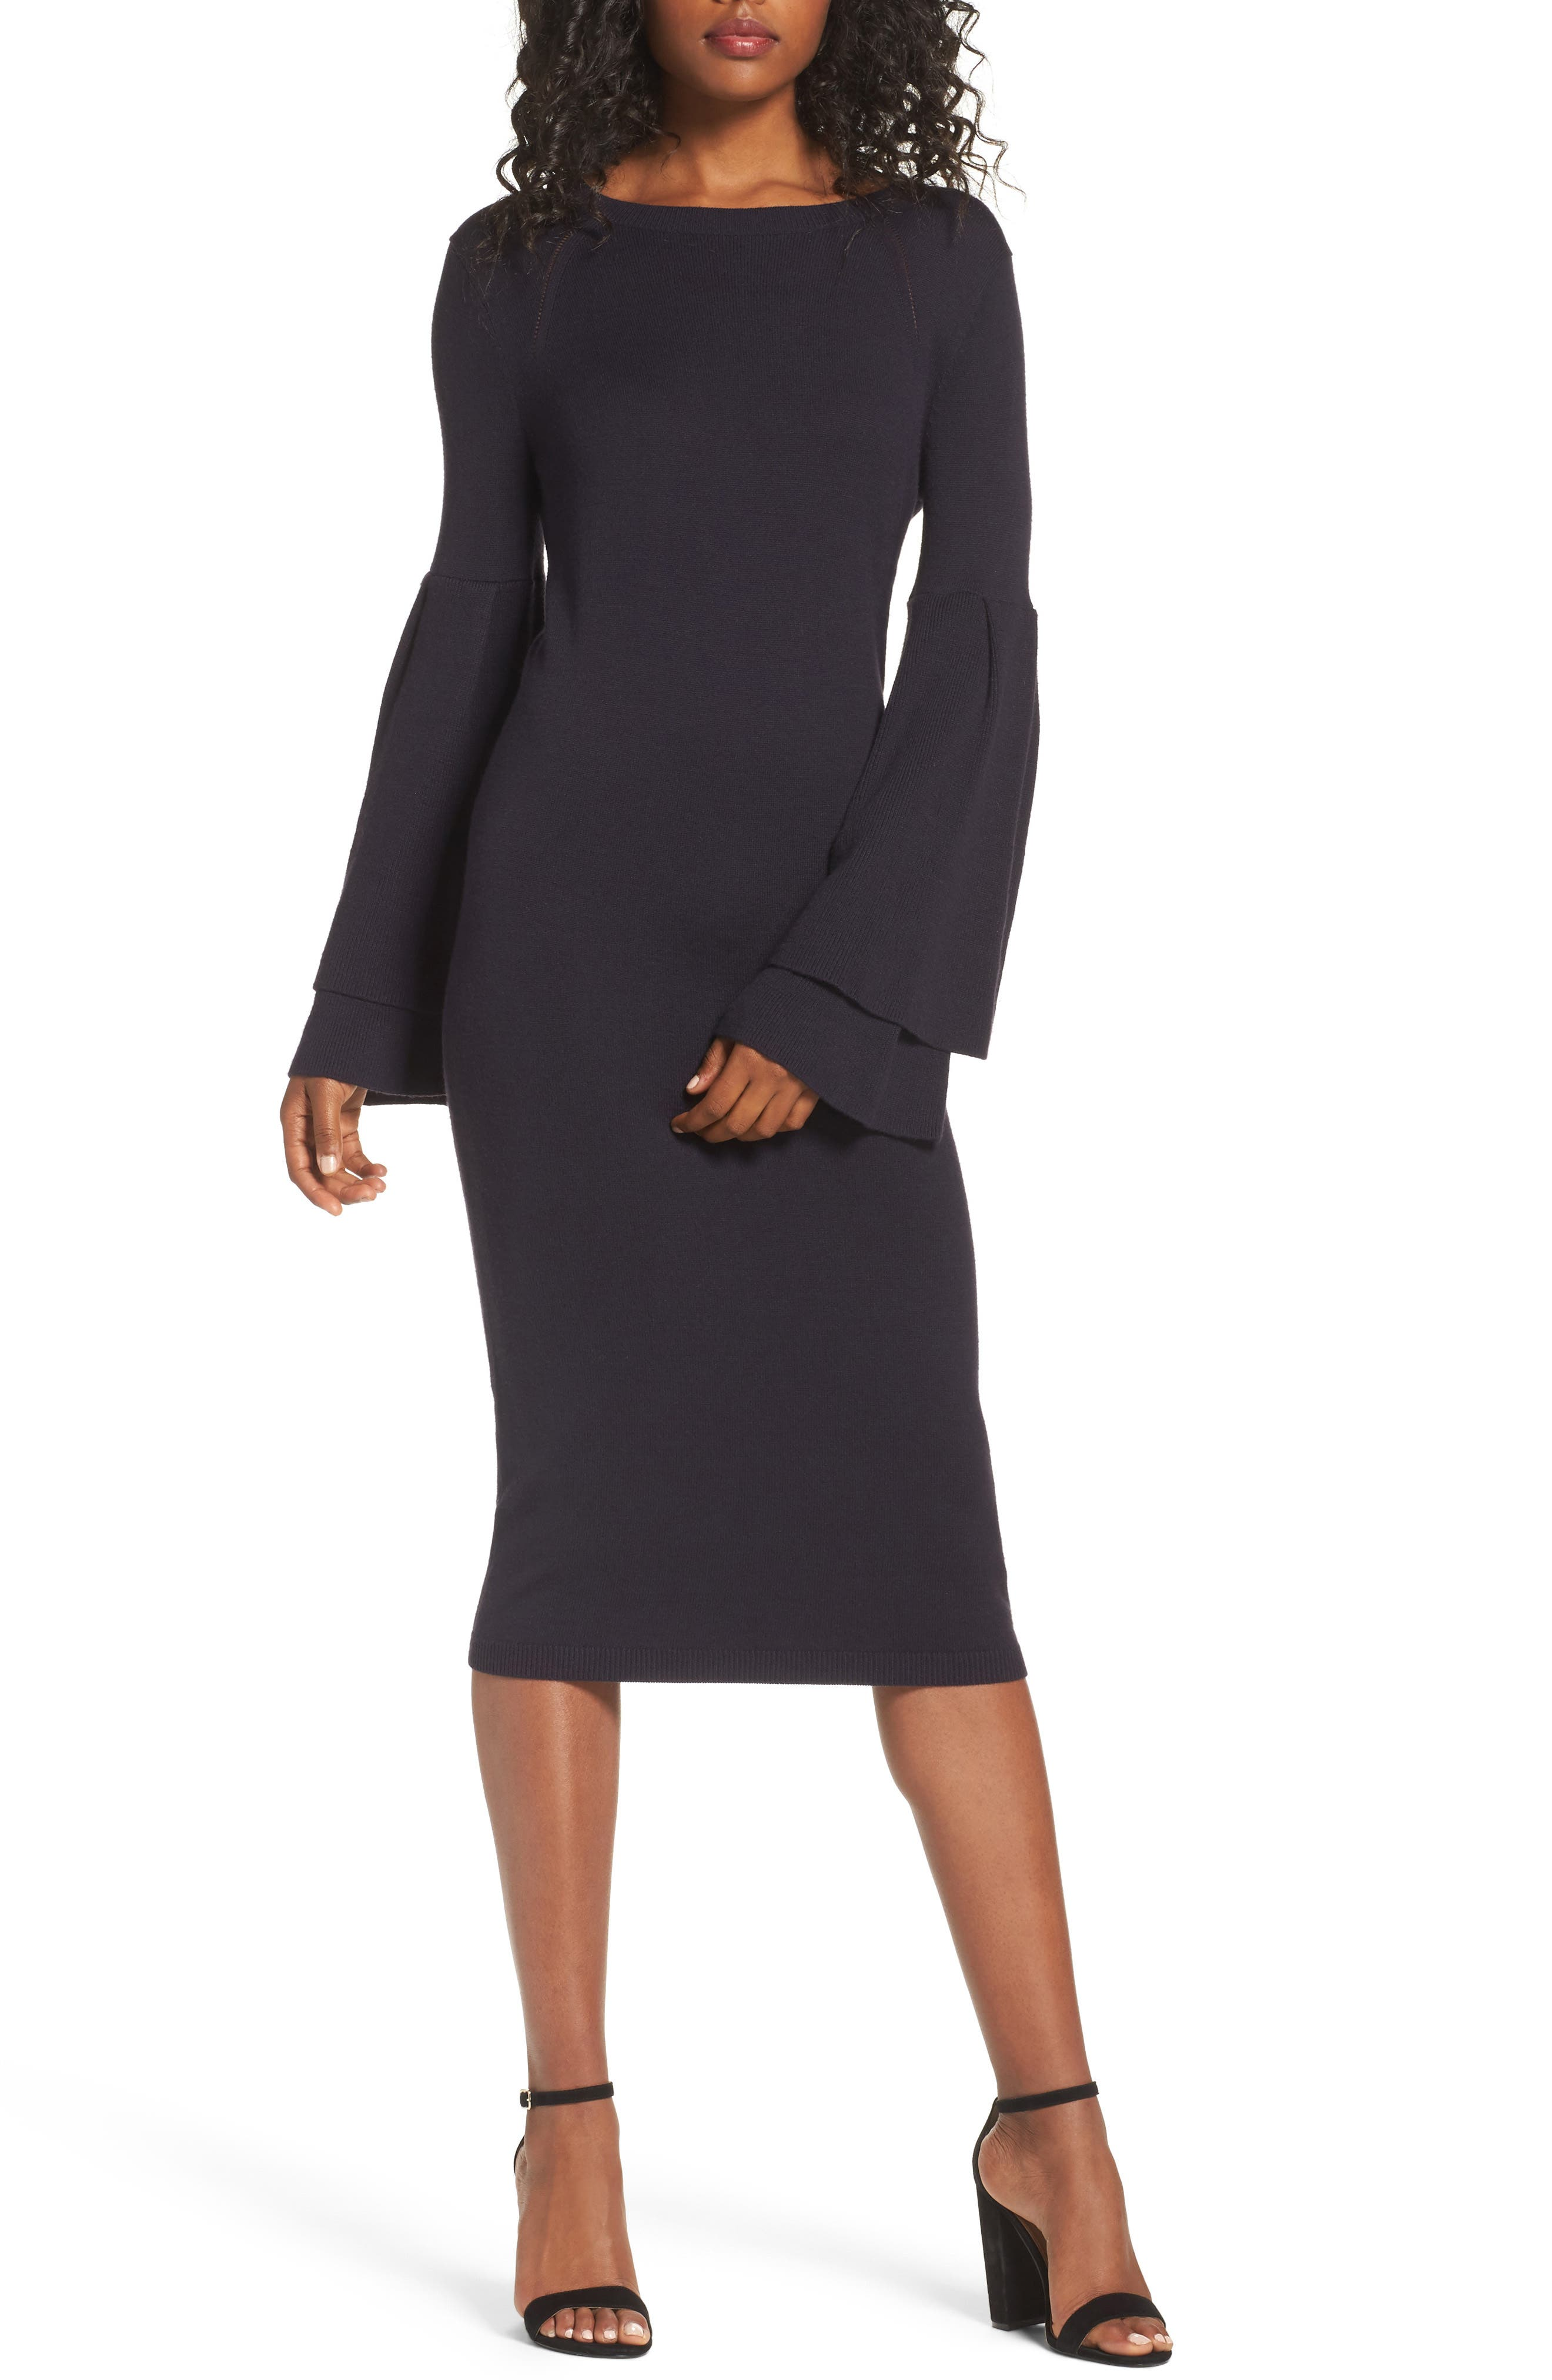 Main Image - Chelsea28 Bell Sleeve Sweater Dress